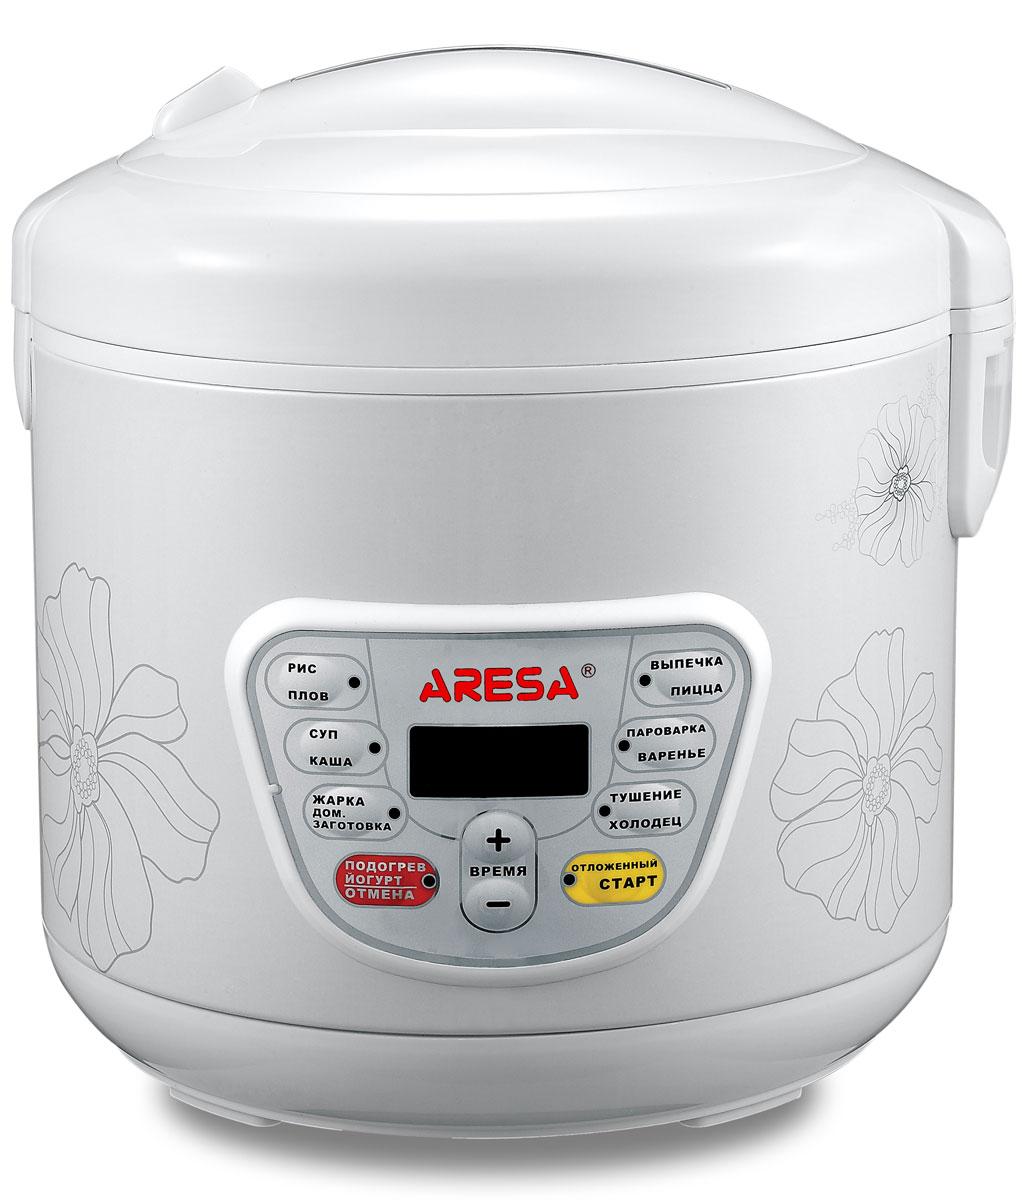 Купить Aresa AR-2001 мультиварка